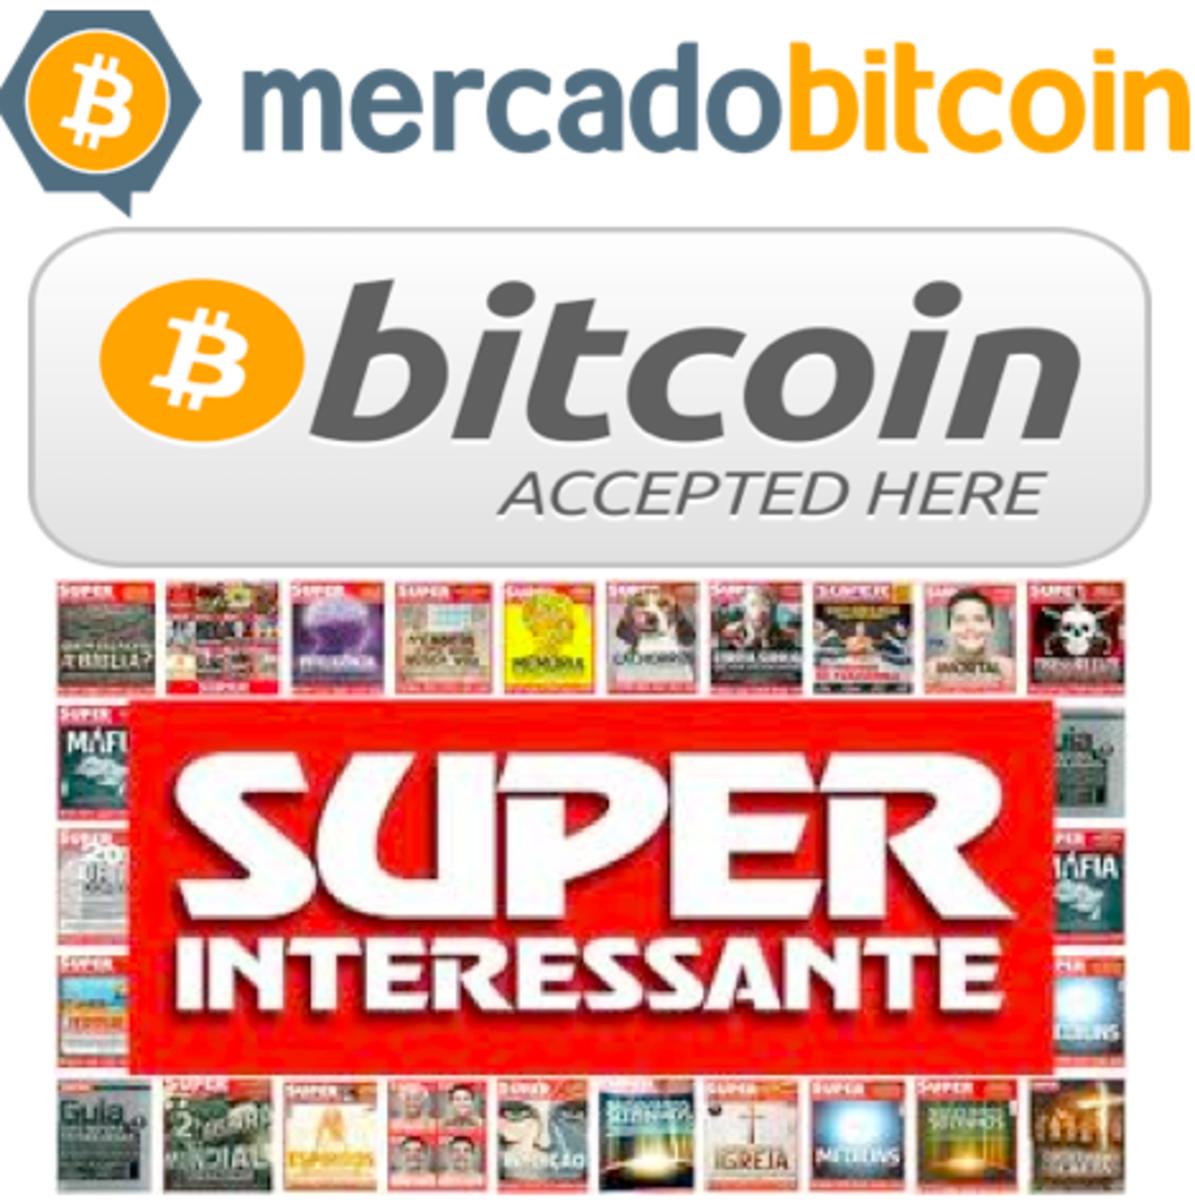 Op-ed - Brazilian Magazine SUPER Embraces Bitcoin